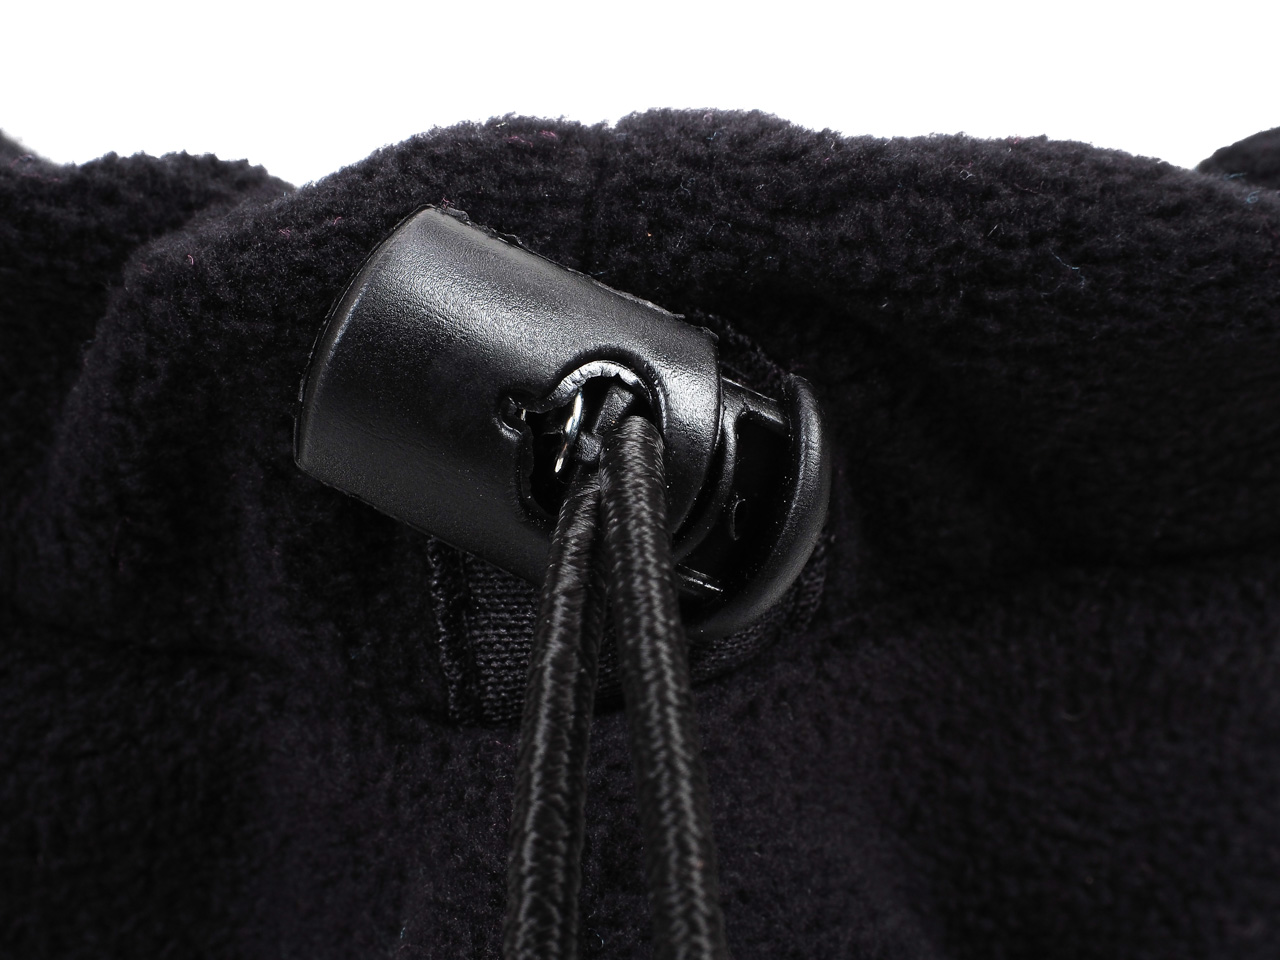 Hood-Winter-Cairn-Hood-Black-Polar-Jr-Black-31198-New thumbnail 3